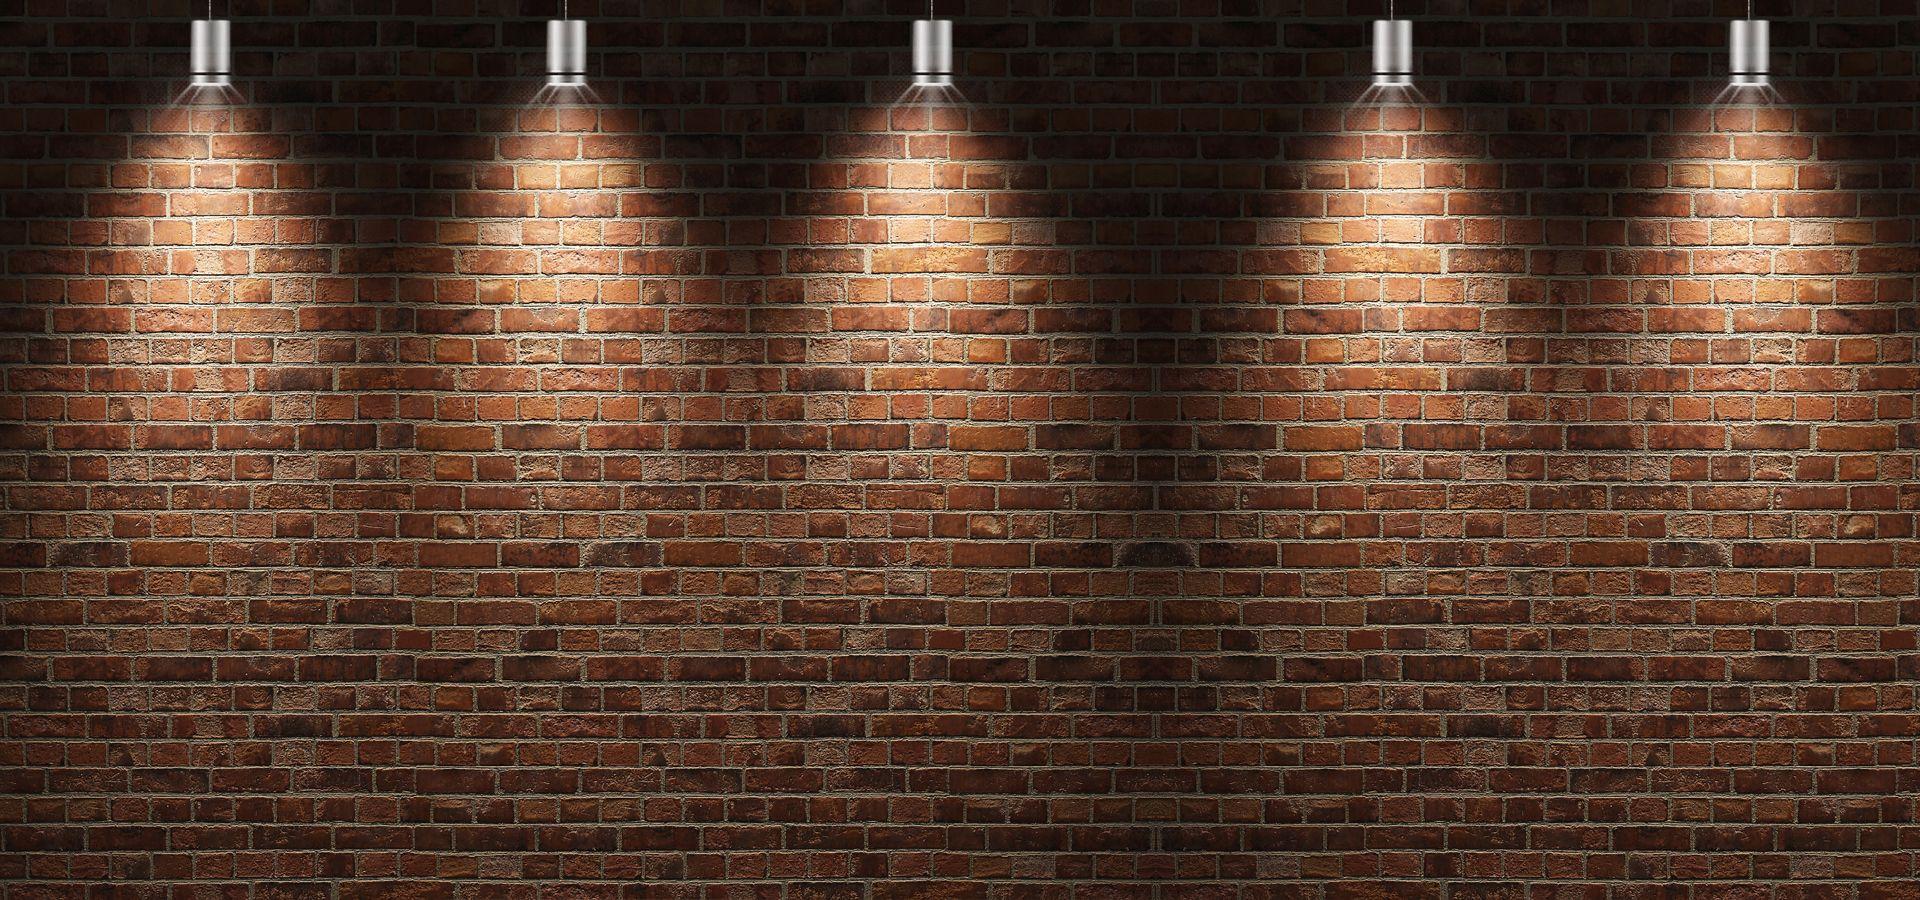 brick walls background lighting brick wall background on brick wall id=43169